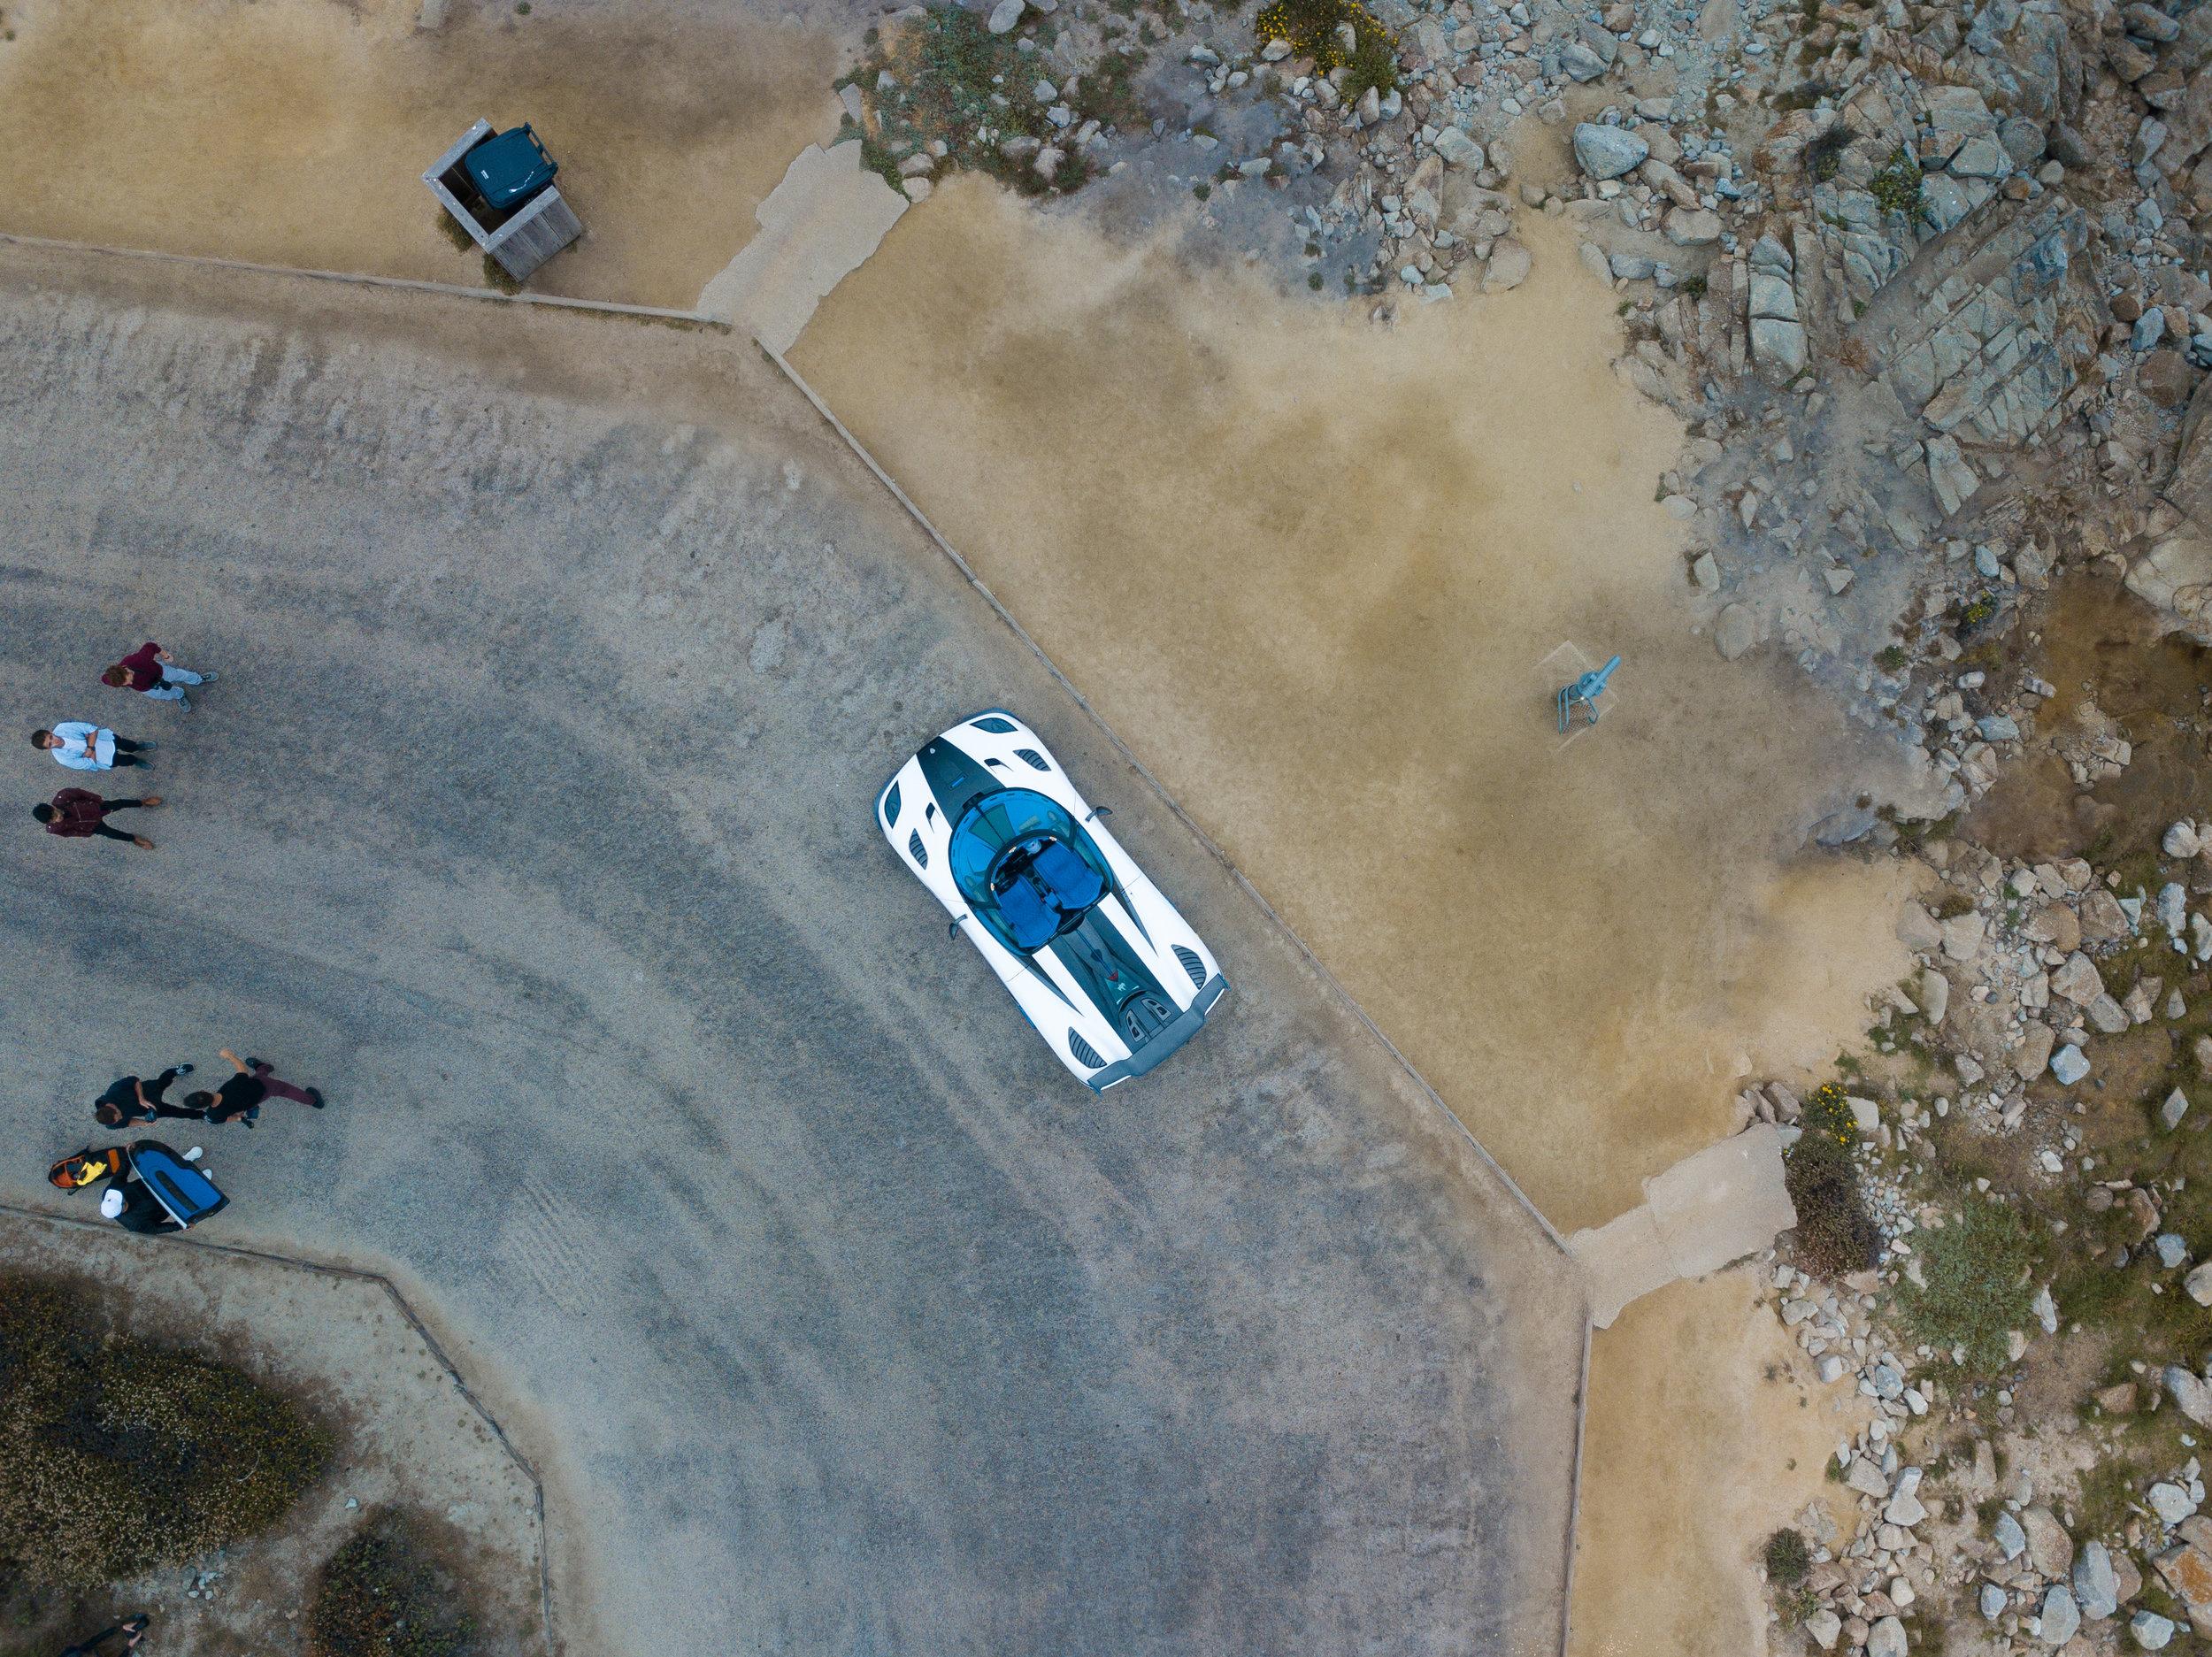 Stay_Driven_Monterey_Car_Week_Koenigsegg_Drone-3.jpg